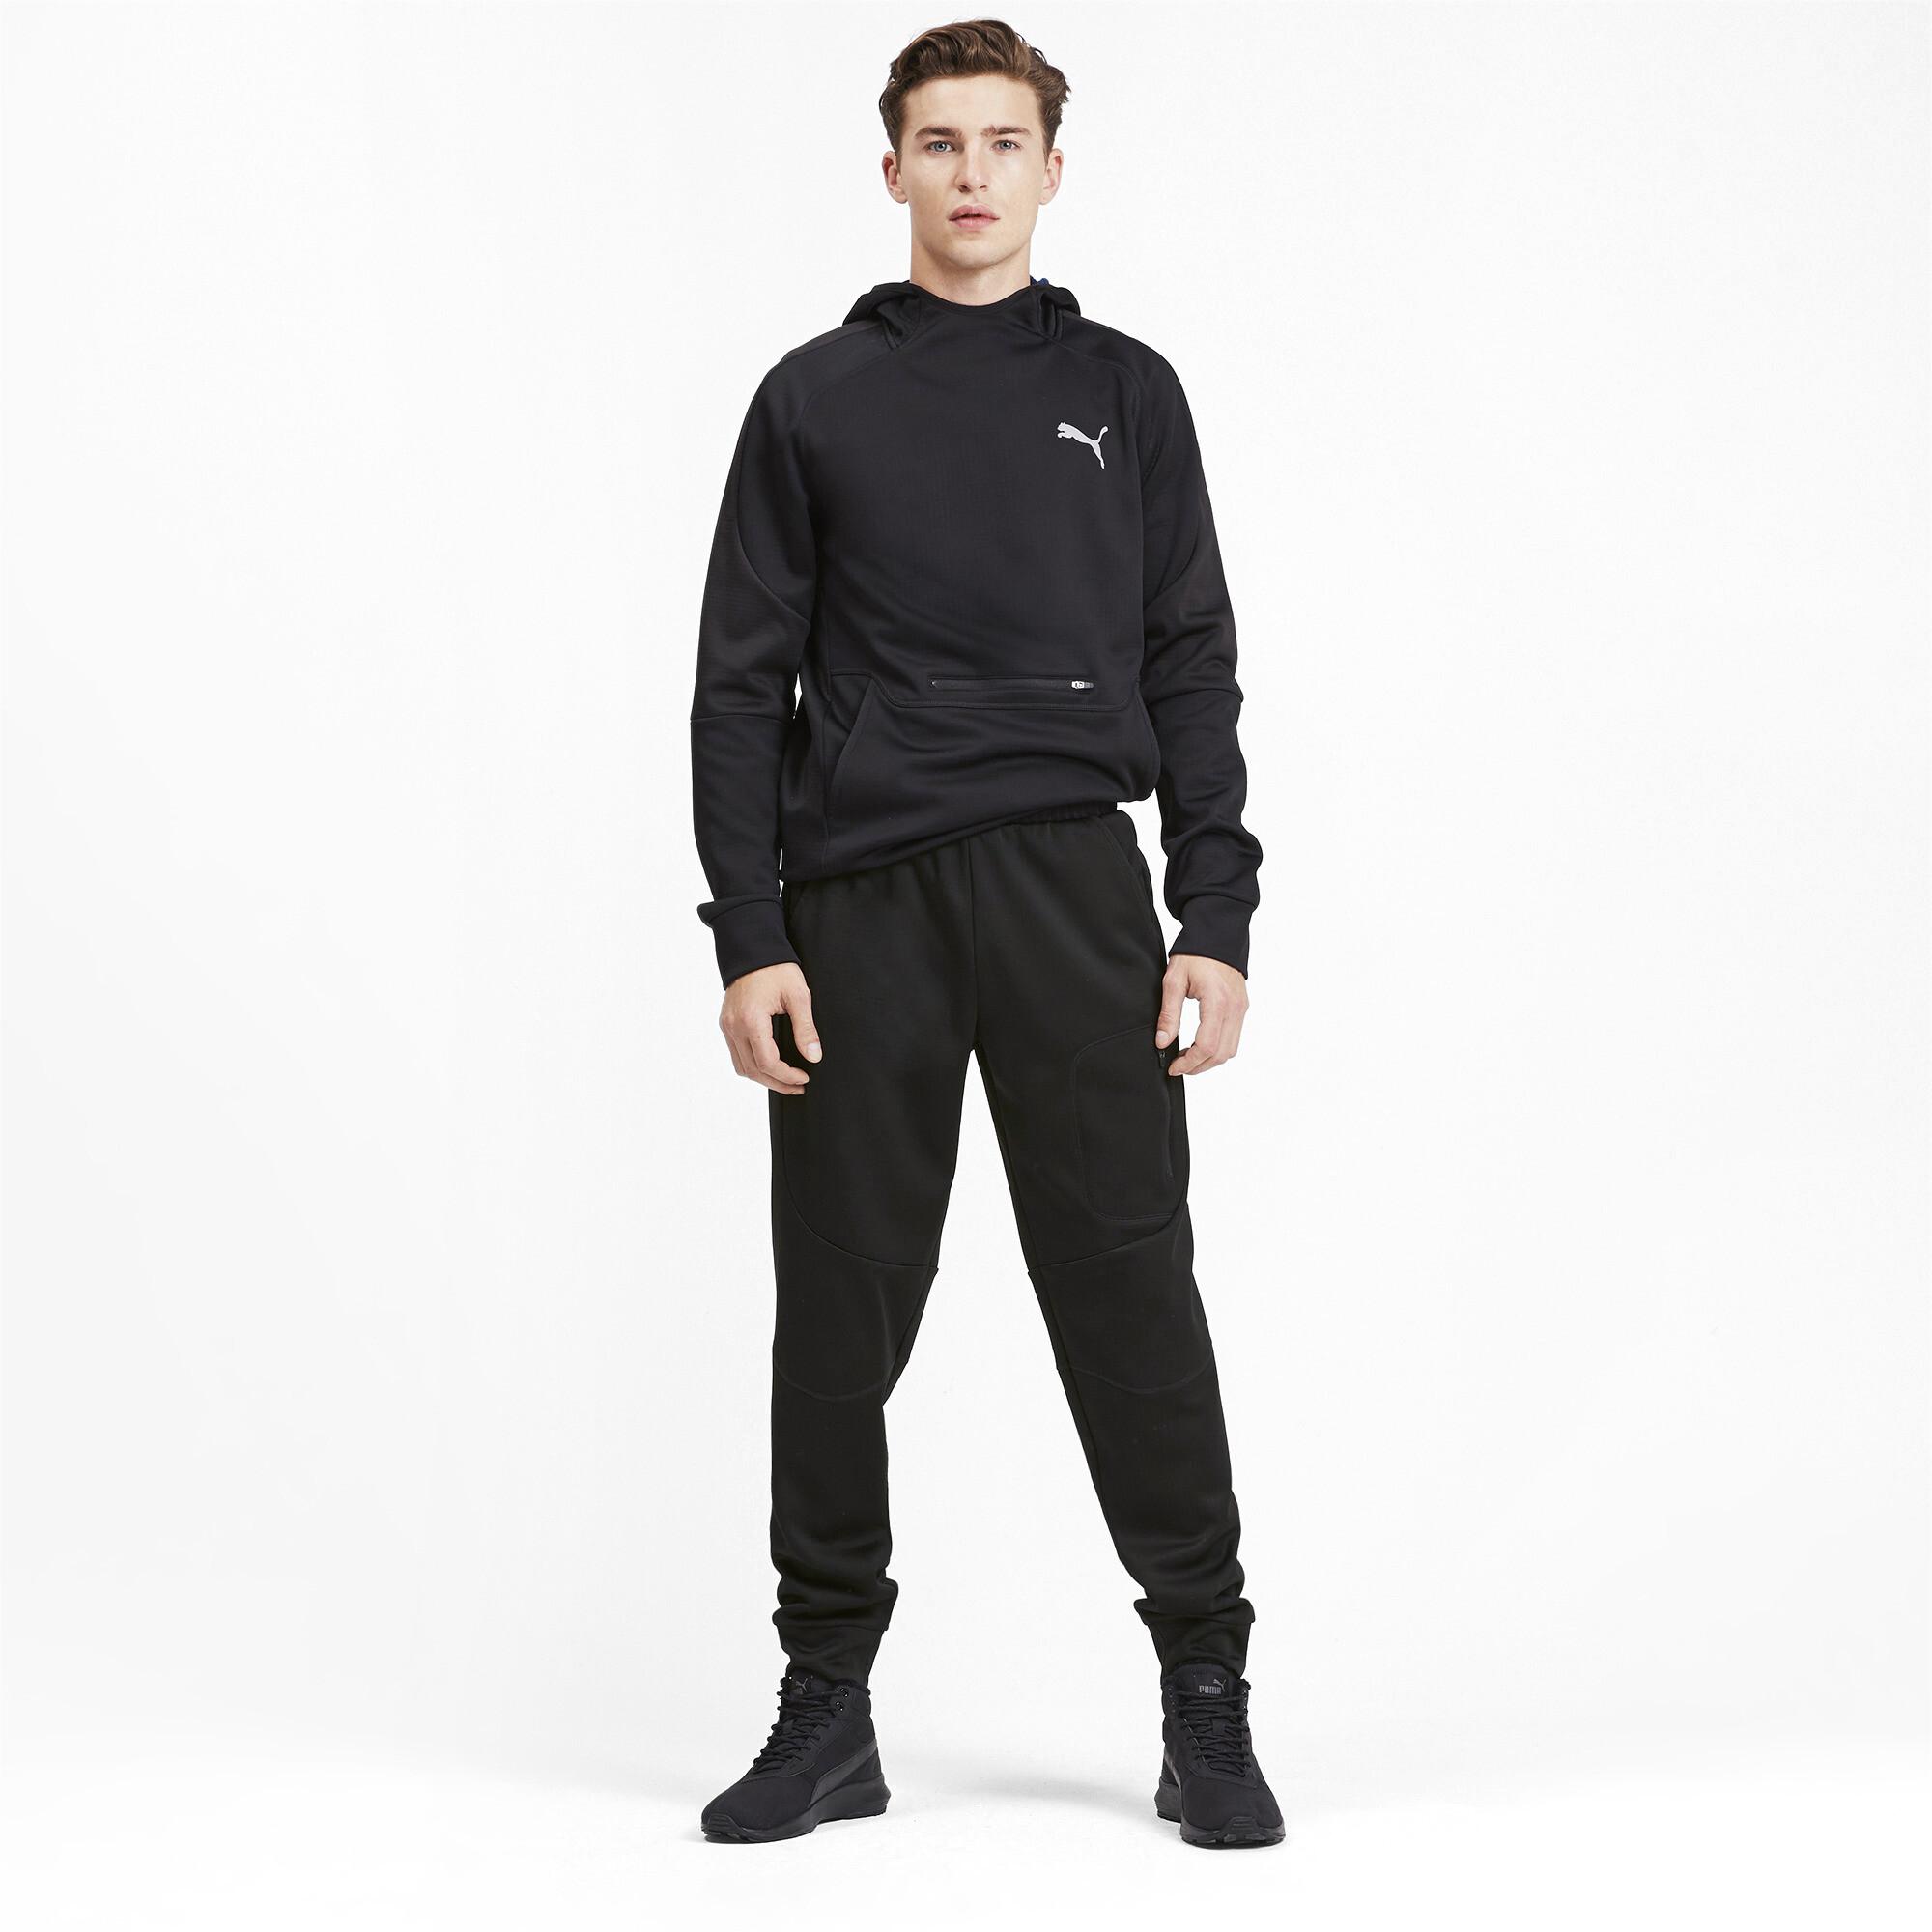 PUMA-Evostripe-Warm-Men-039-s-Pants-Men-Knitted-Pants-Basics miniatura 11